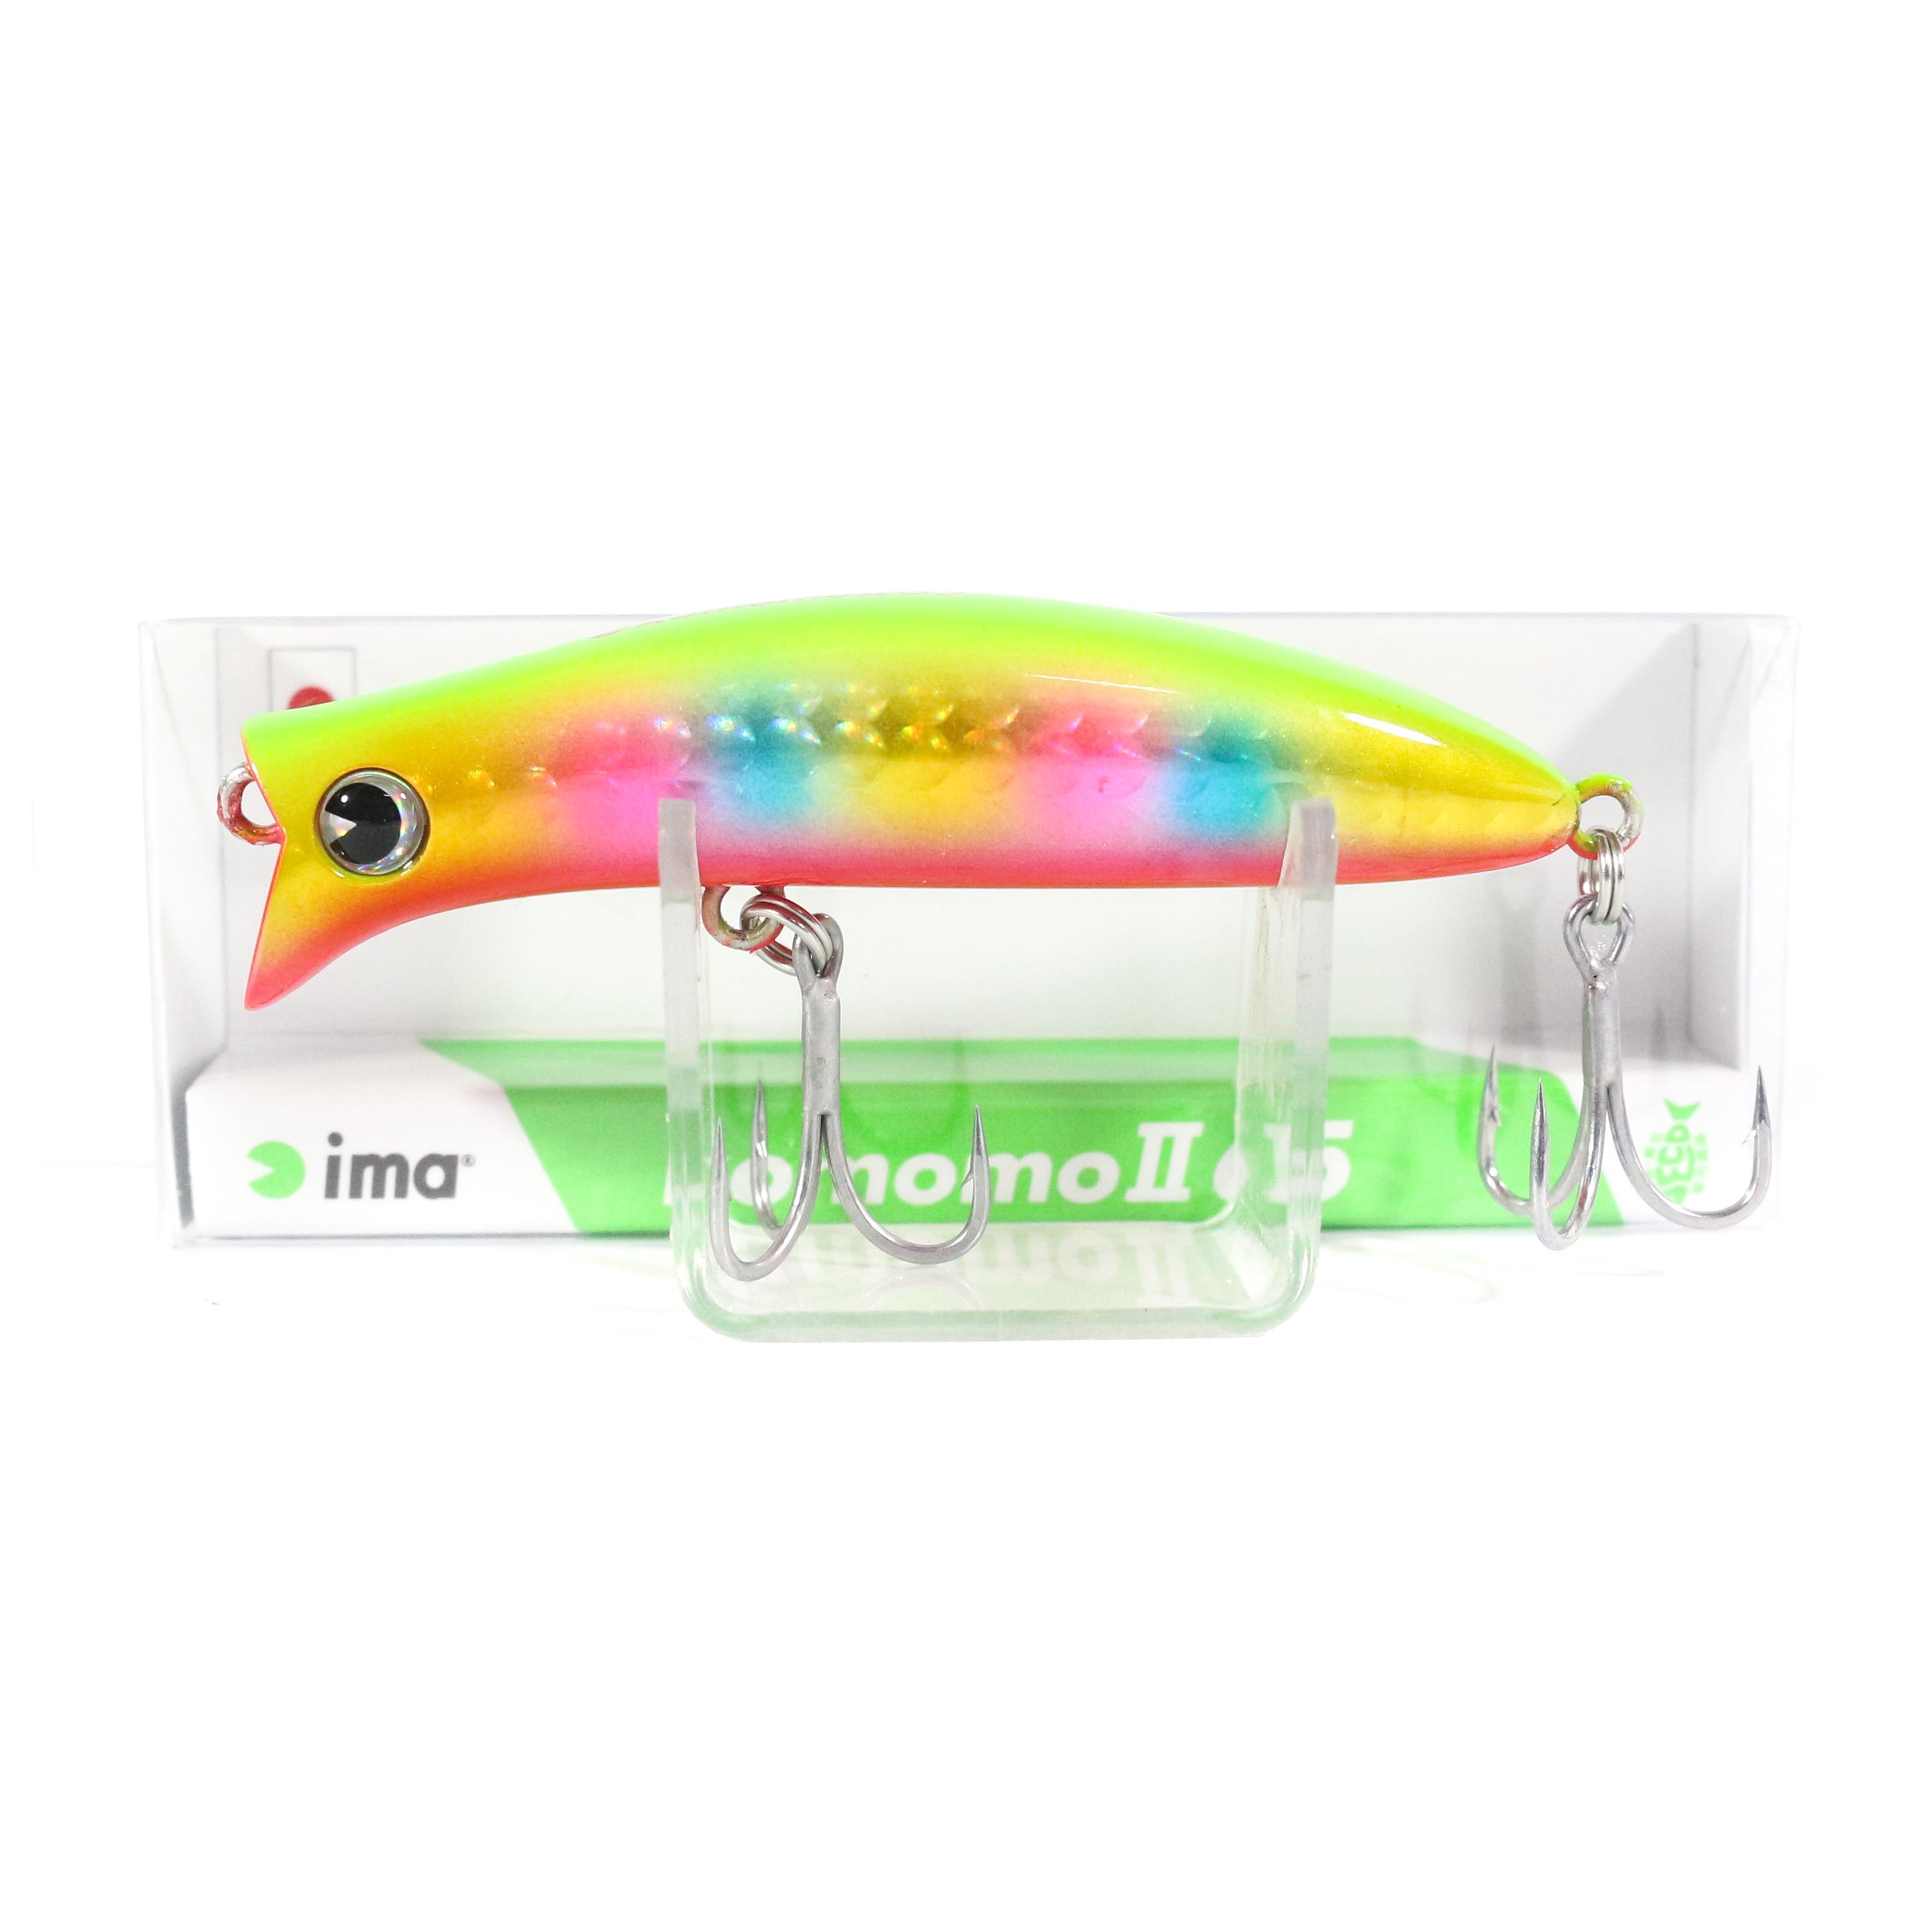 Ima Komomo II 65 Floating Lure 004-8434 for sale online